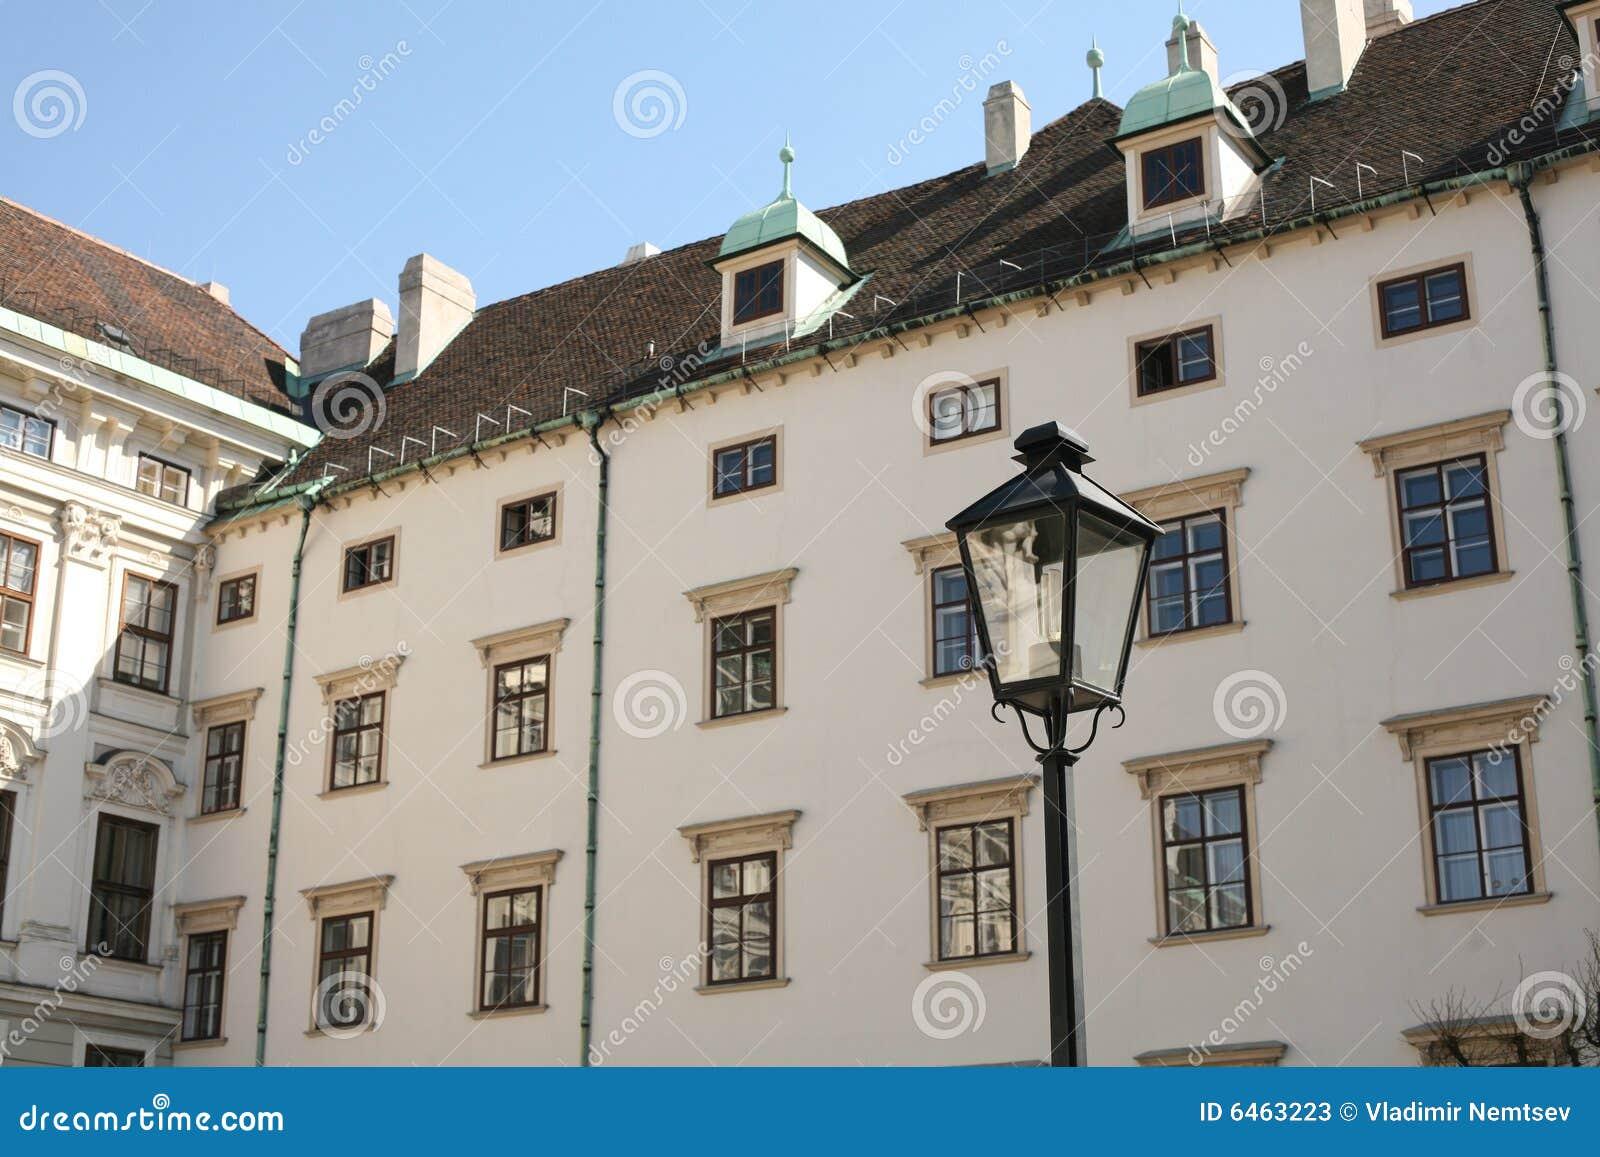 Old street lantern